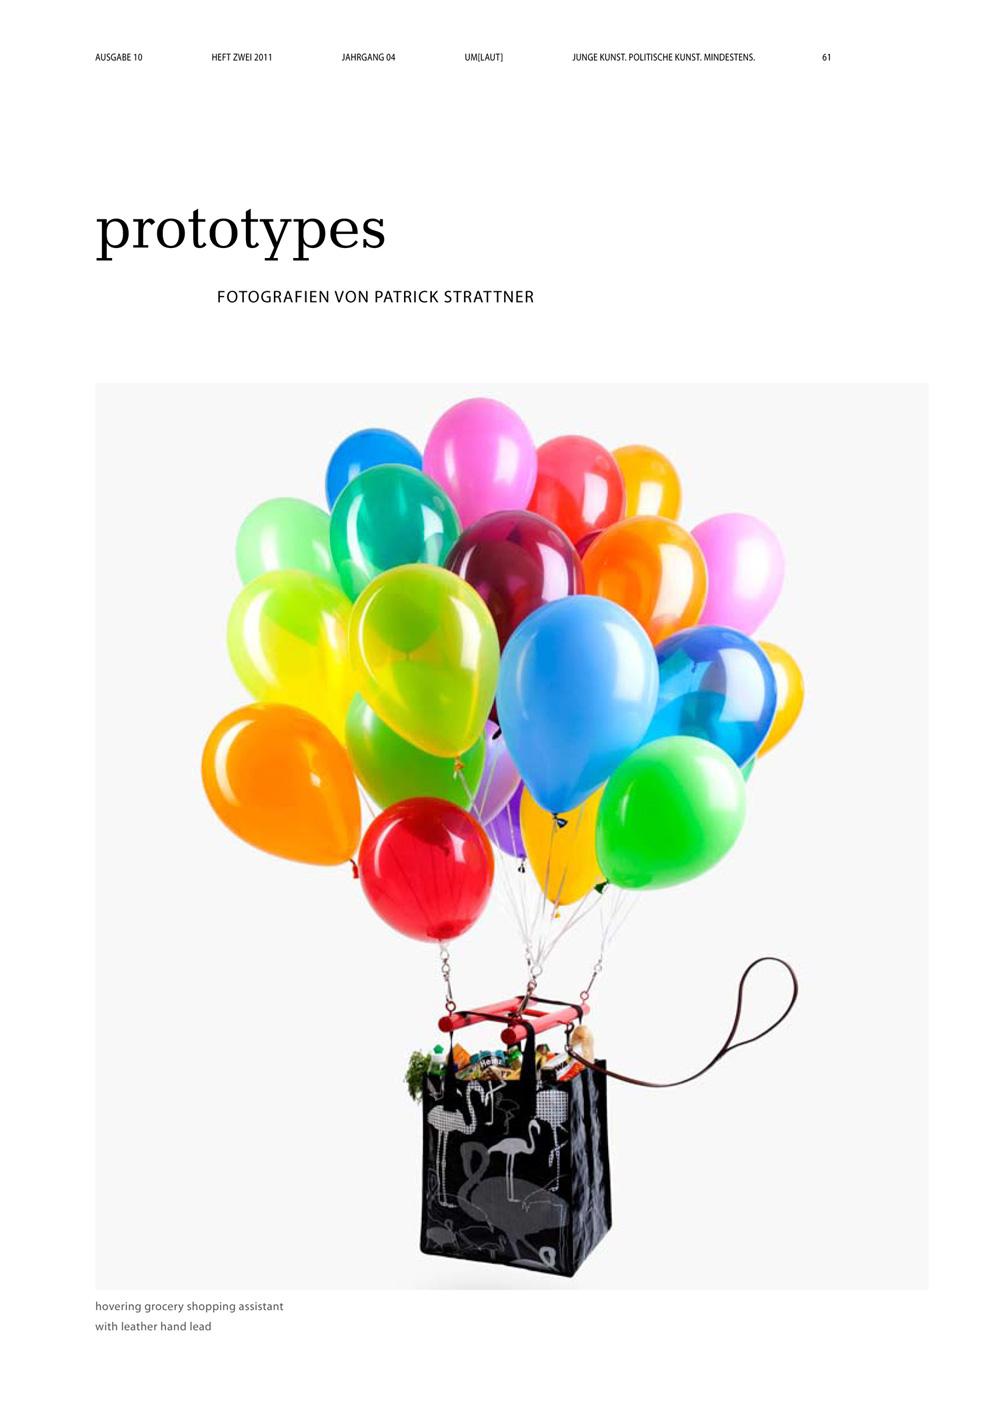 patrick-strattner-photography-prototypes-umlaut-ts-01